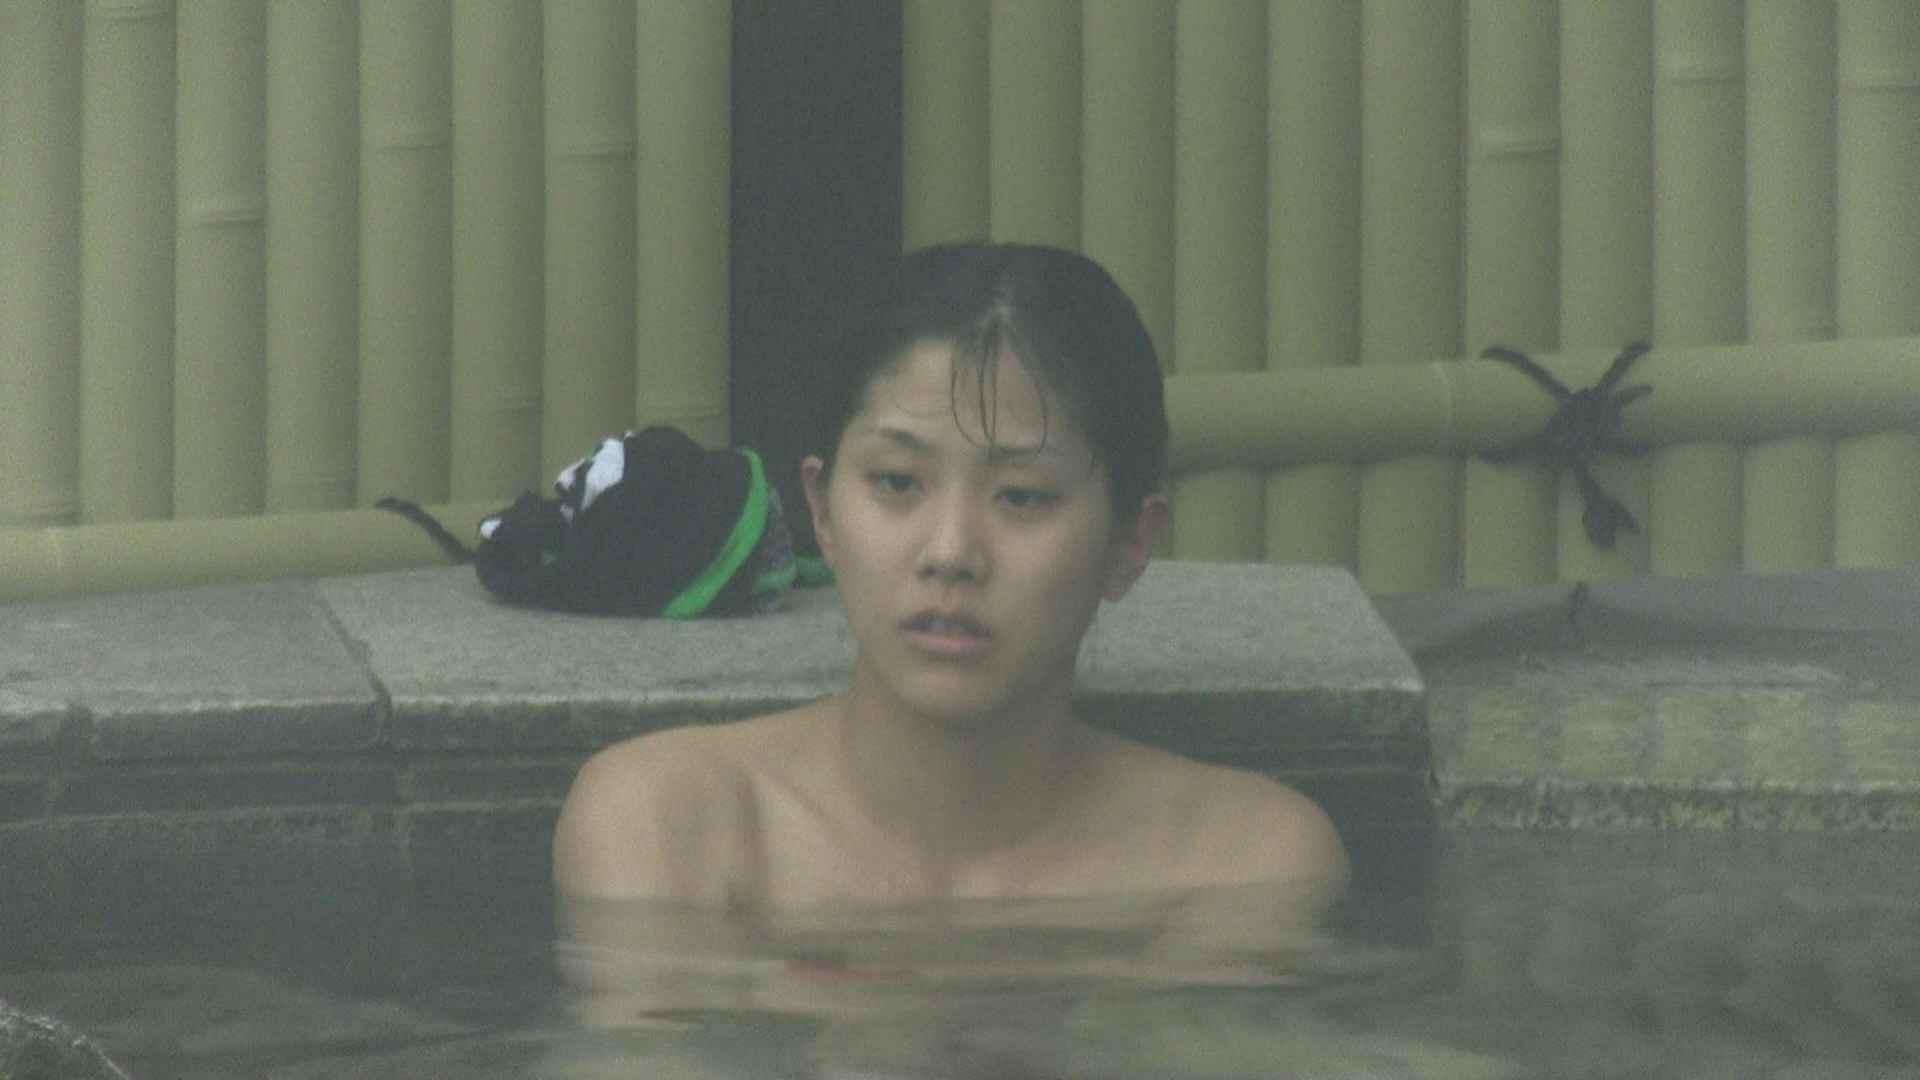 Aquaな露天風呂Vol.174 OLのエロ生活 すけべAV動画紹介 89連発 62